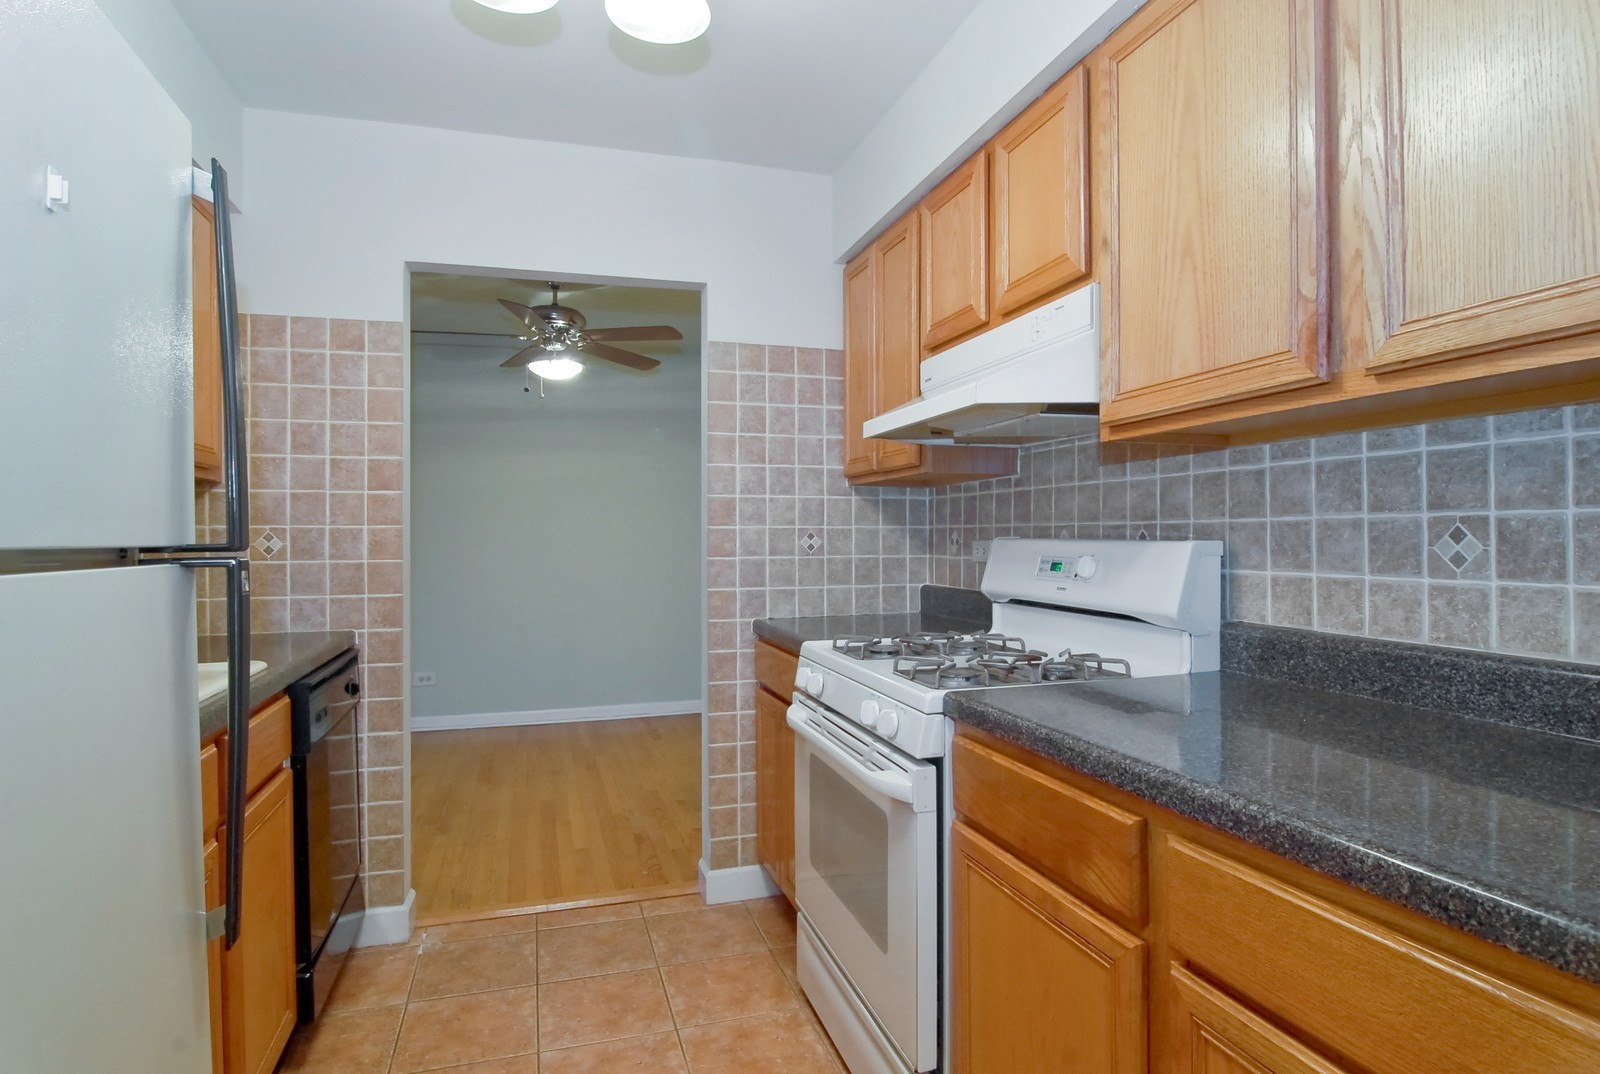 Real Estate Photography - 800 Washington Blvd, Unit 402, Oak Park, IL, 60302 - Kitchen